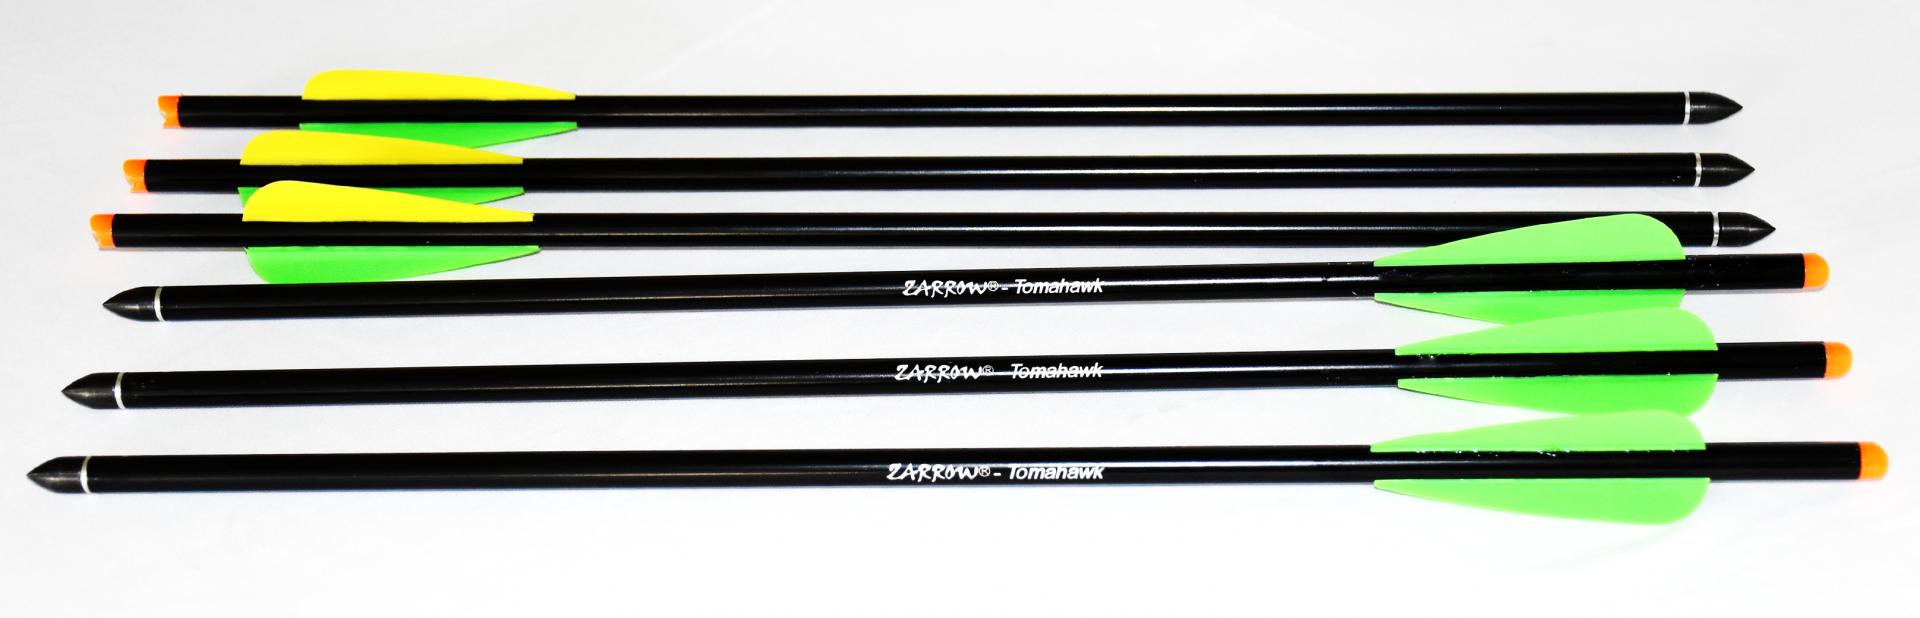 Zarrow tomohawk crossbow aluminum arrow 2